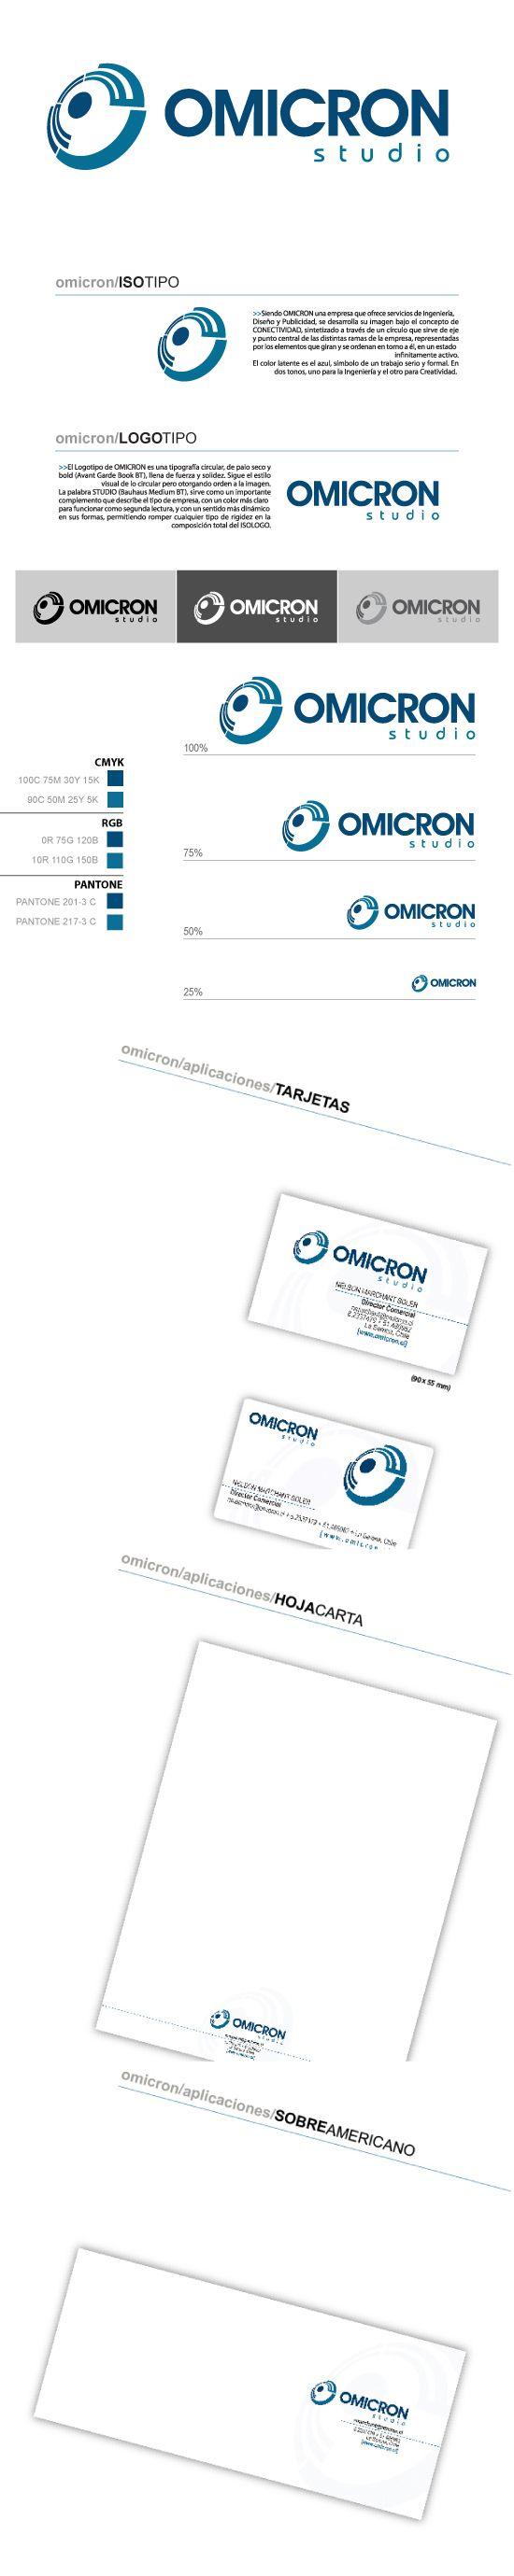 2007 / Omicron on Behance #graphic #design #branding #logotype #illustrator